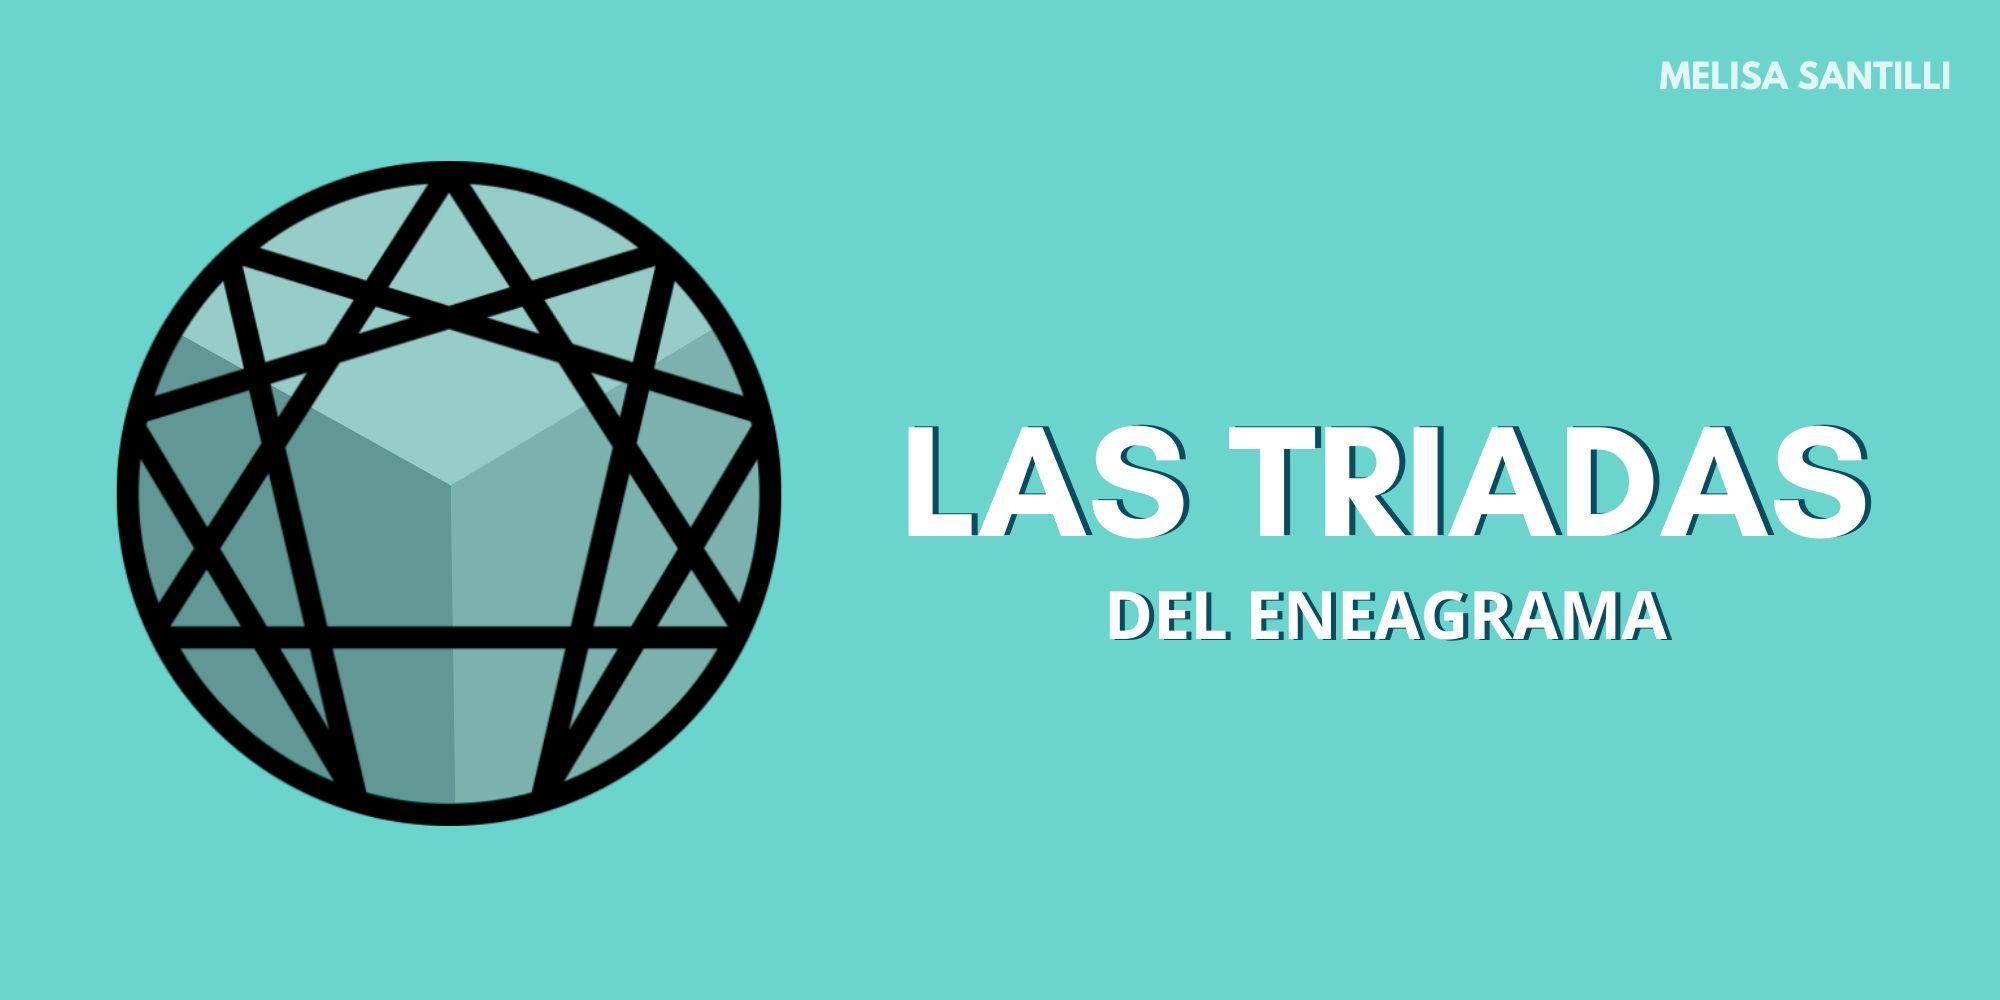 Triadas Eneagrama - Melisa Santilli